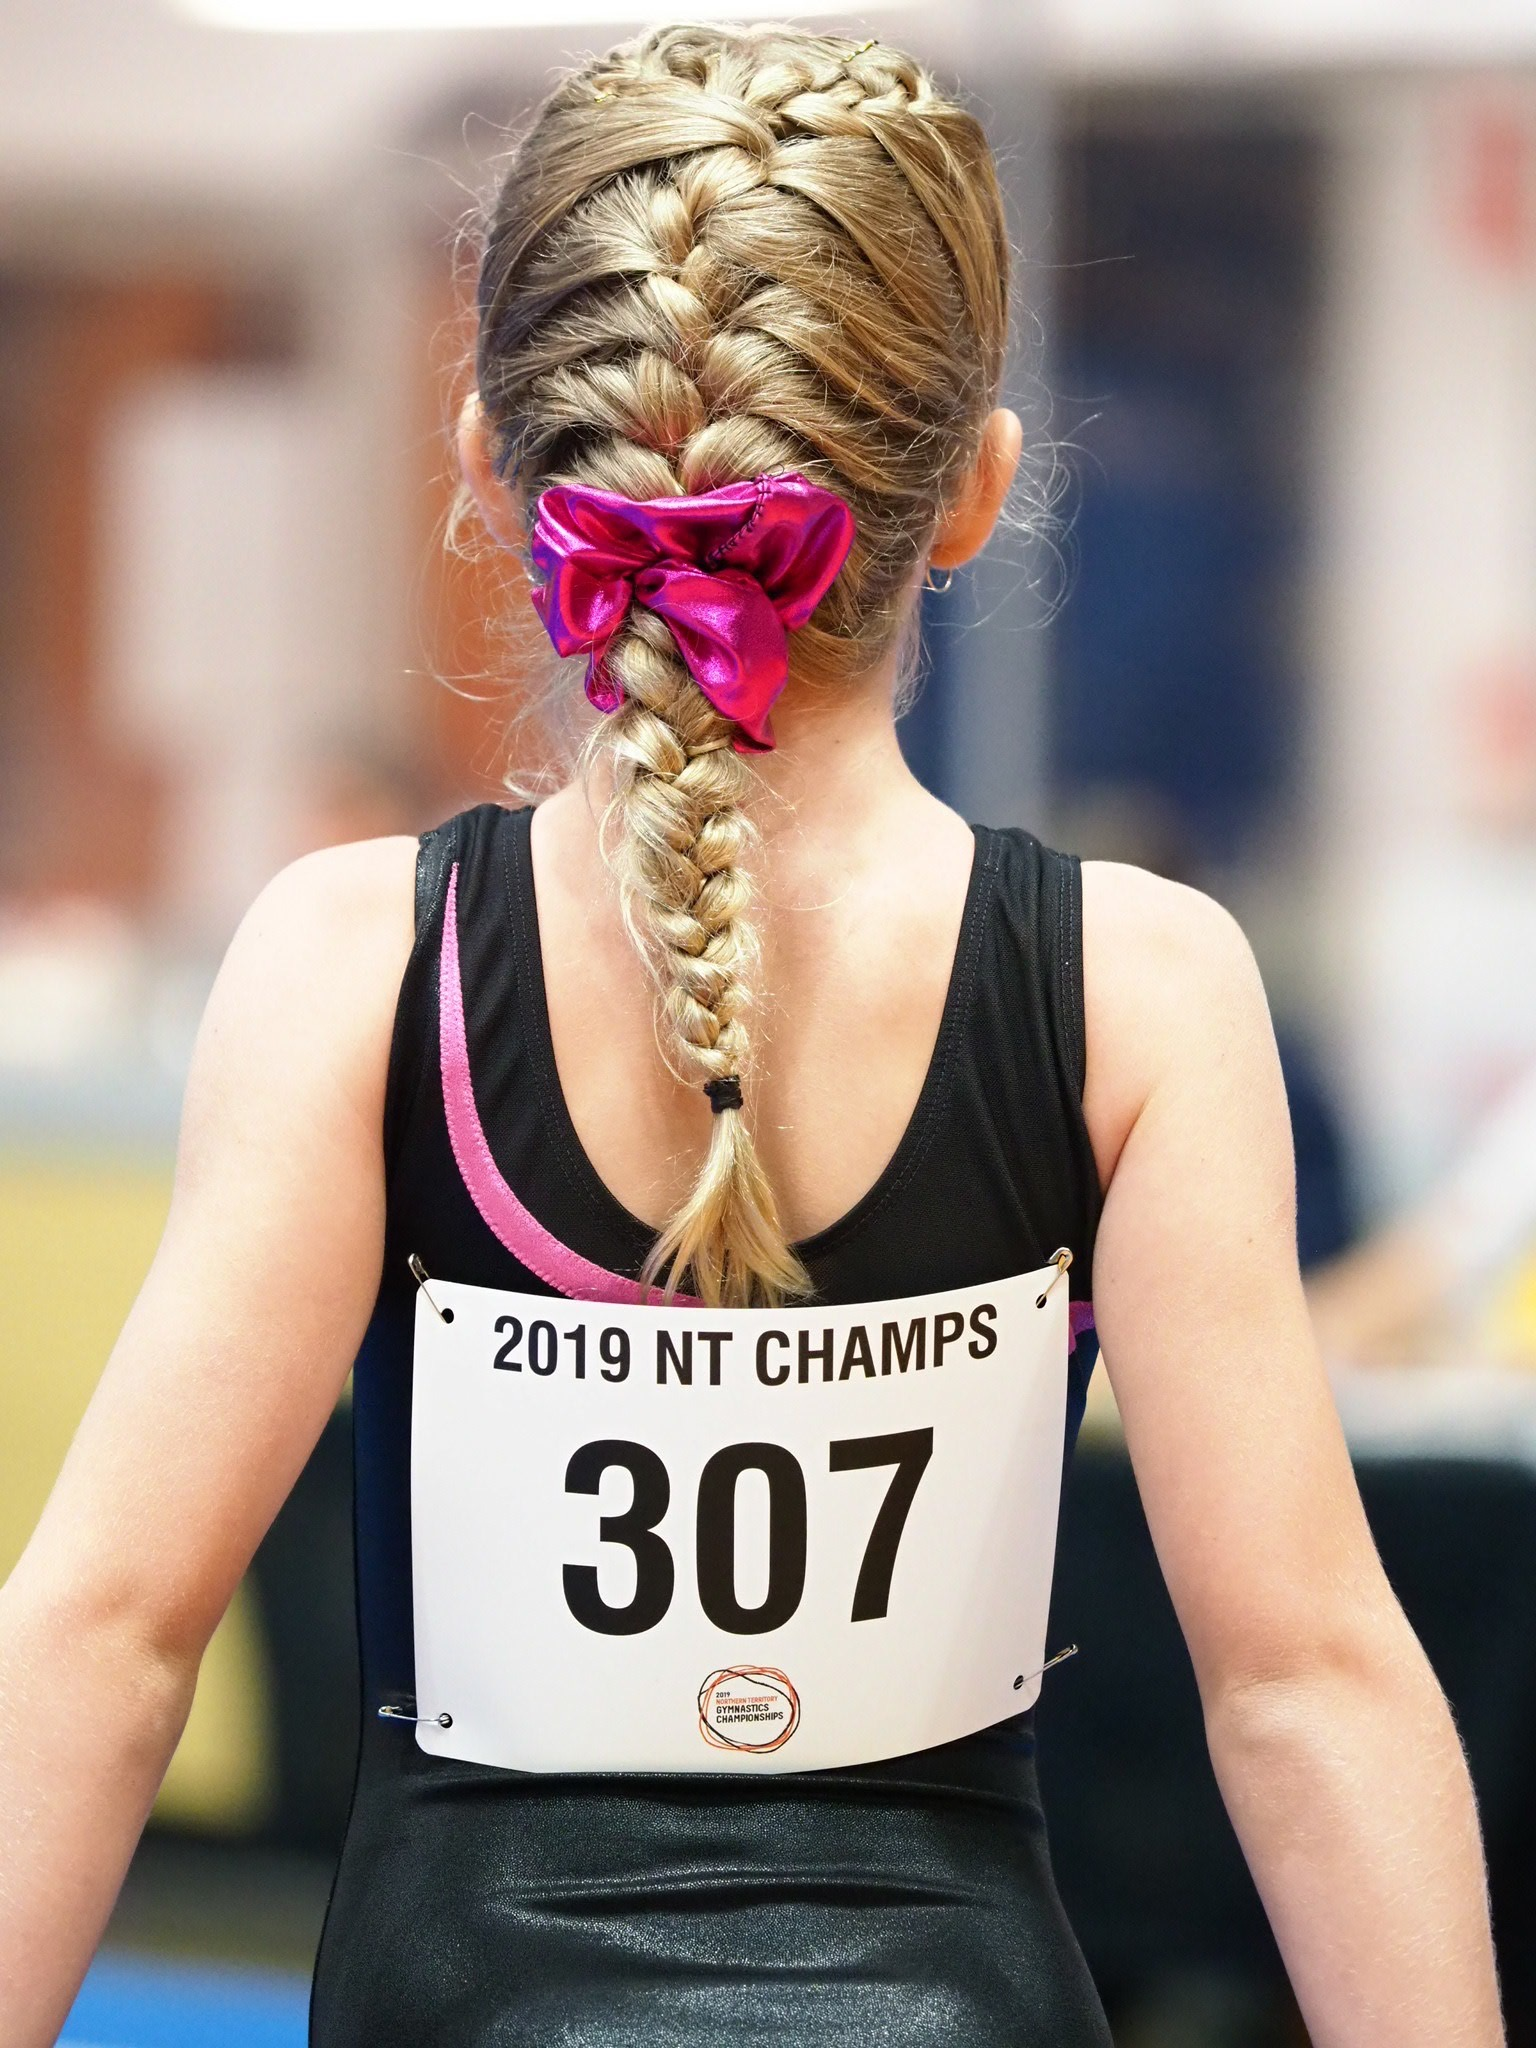 2019 NT Championships